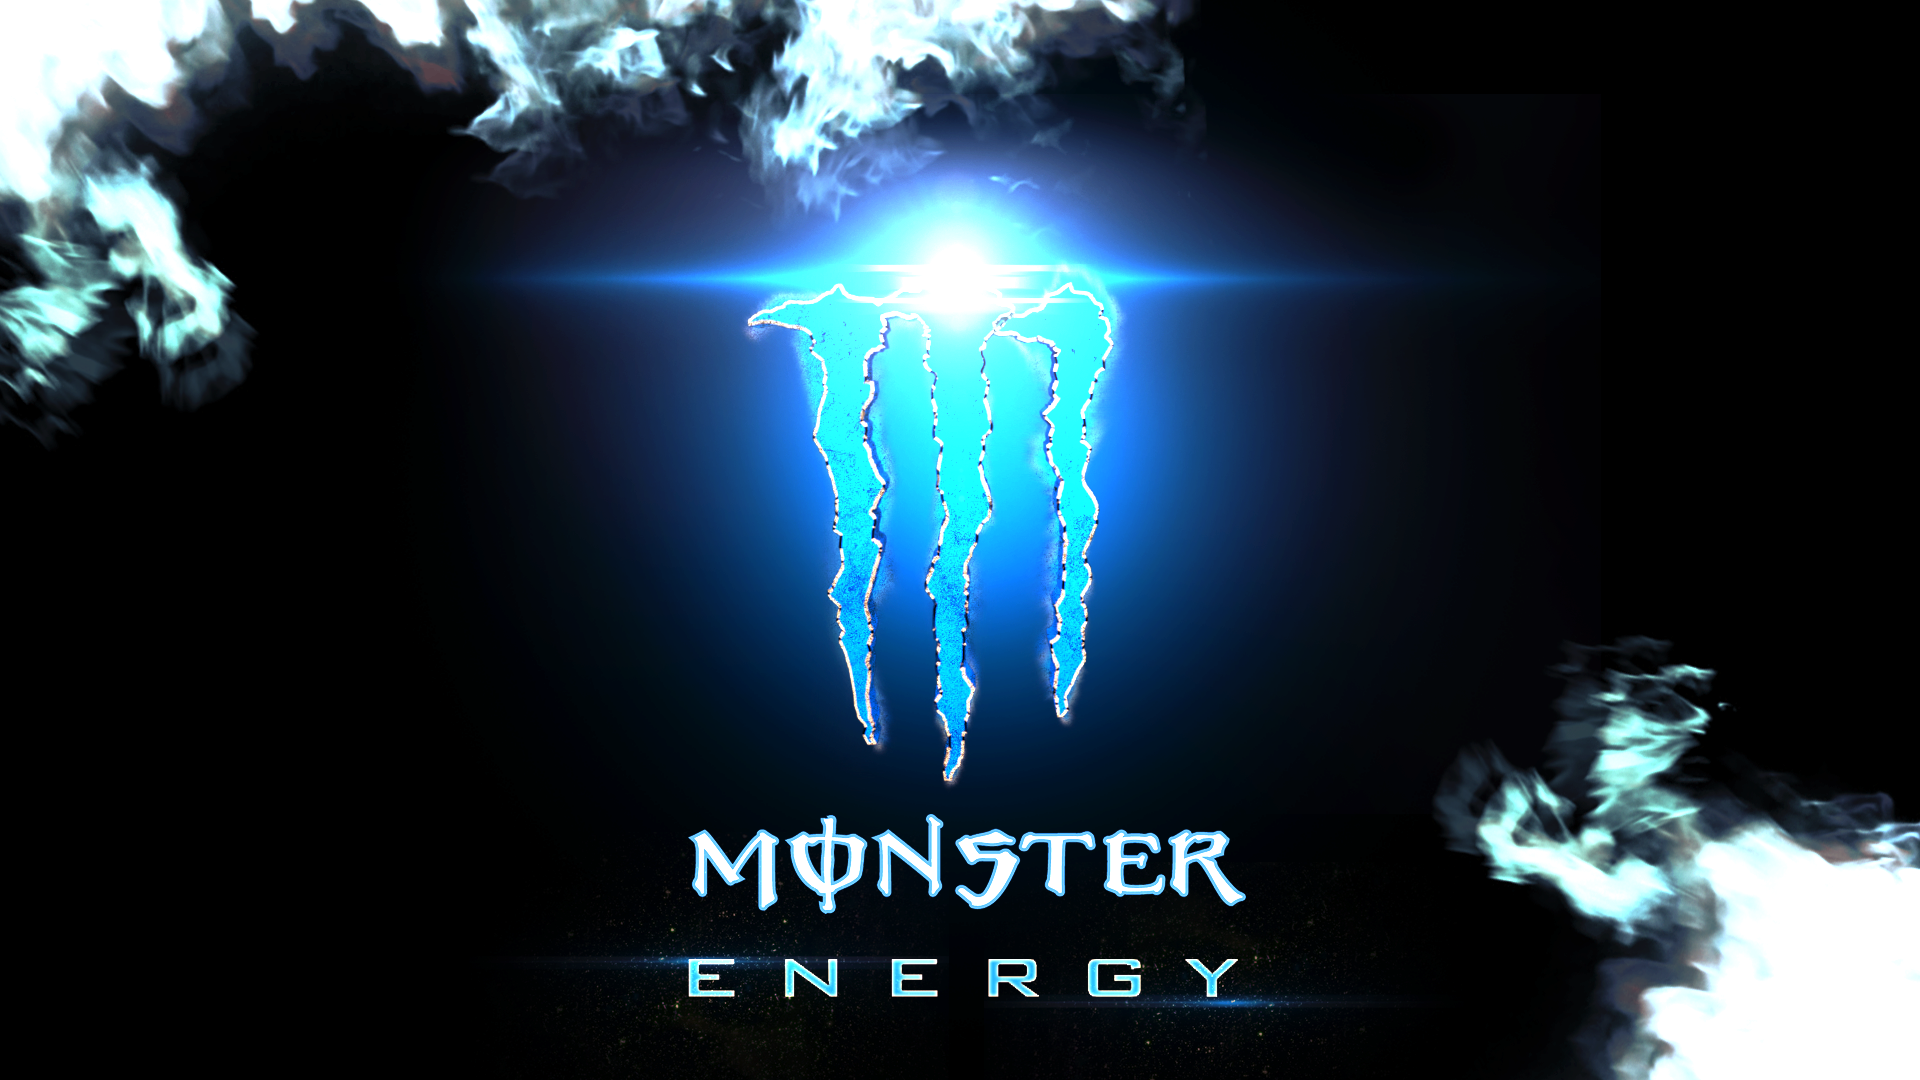 Monster Energy Desktop Wallpaper HD 1920x1080